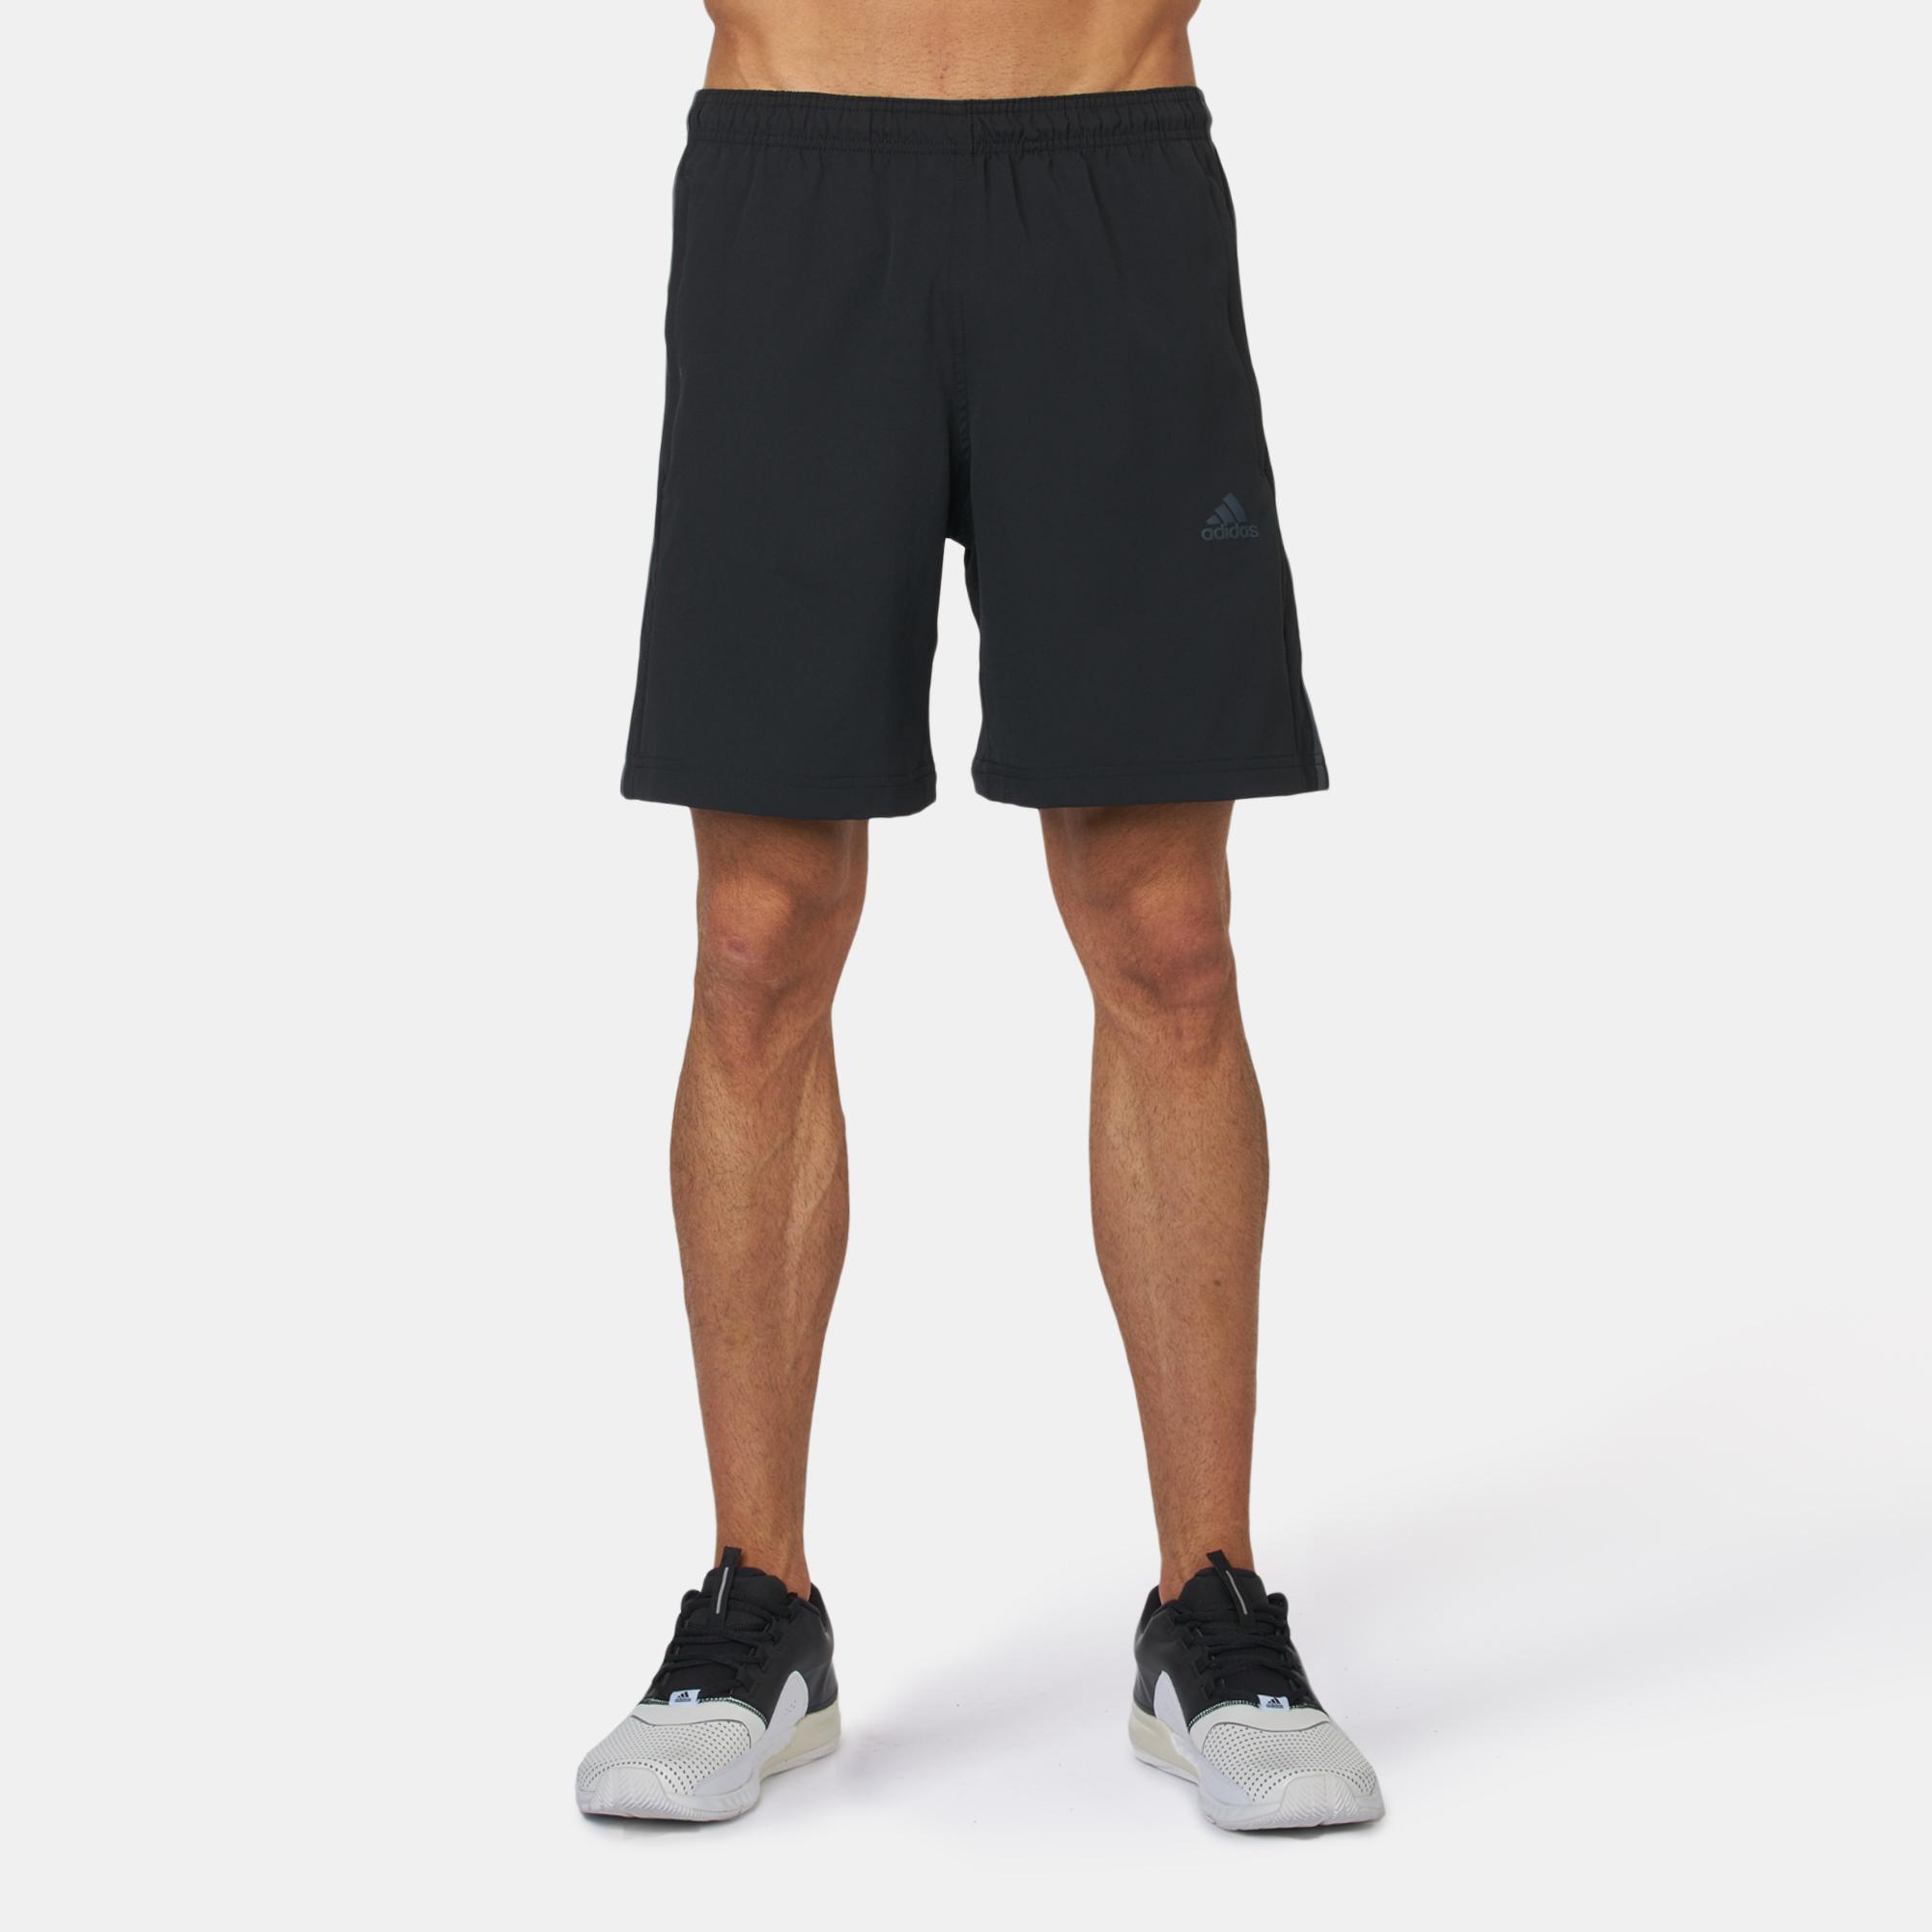 adidas Cool365 Woven Shorts | Shorts | Clothing | Men's Sale